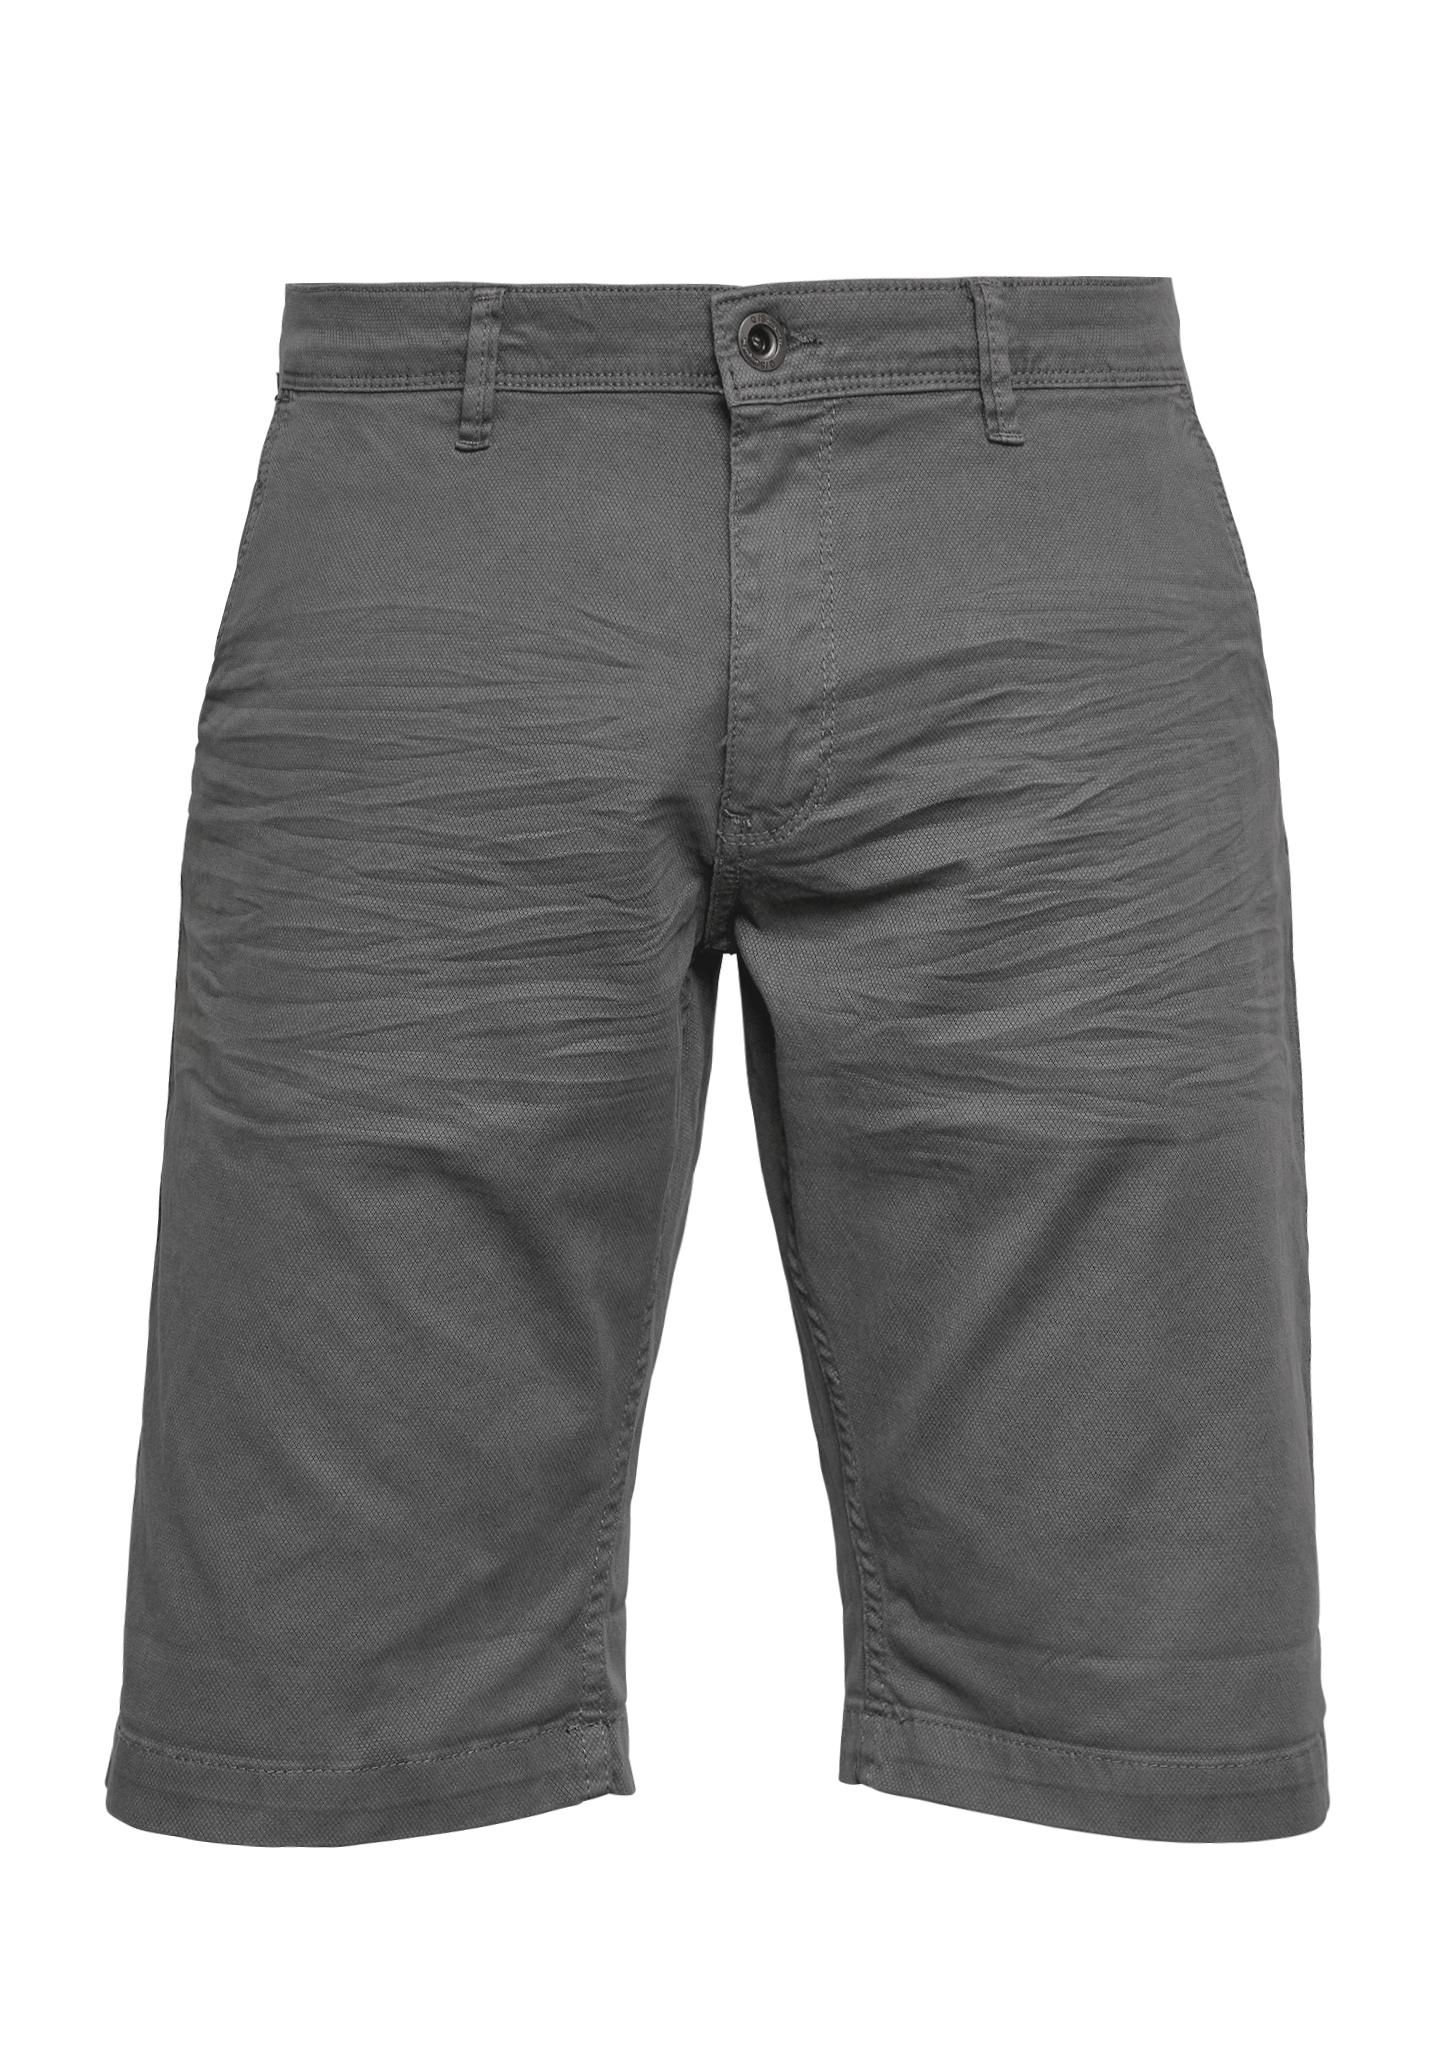 Bermuda   Bekleidung > Shorts & Bermudas   Grau/schwarz   98% baumwolle -  2% elasthan   Q/S designed by